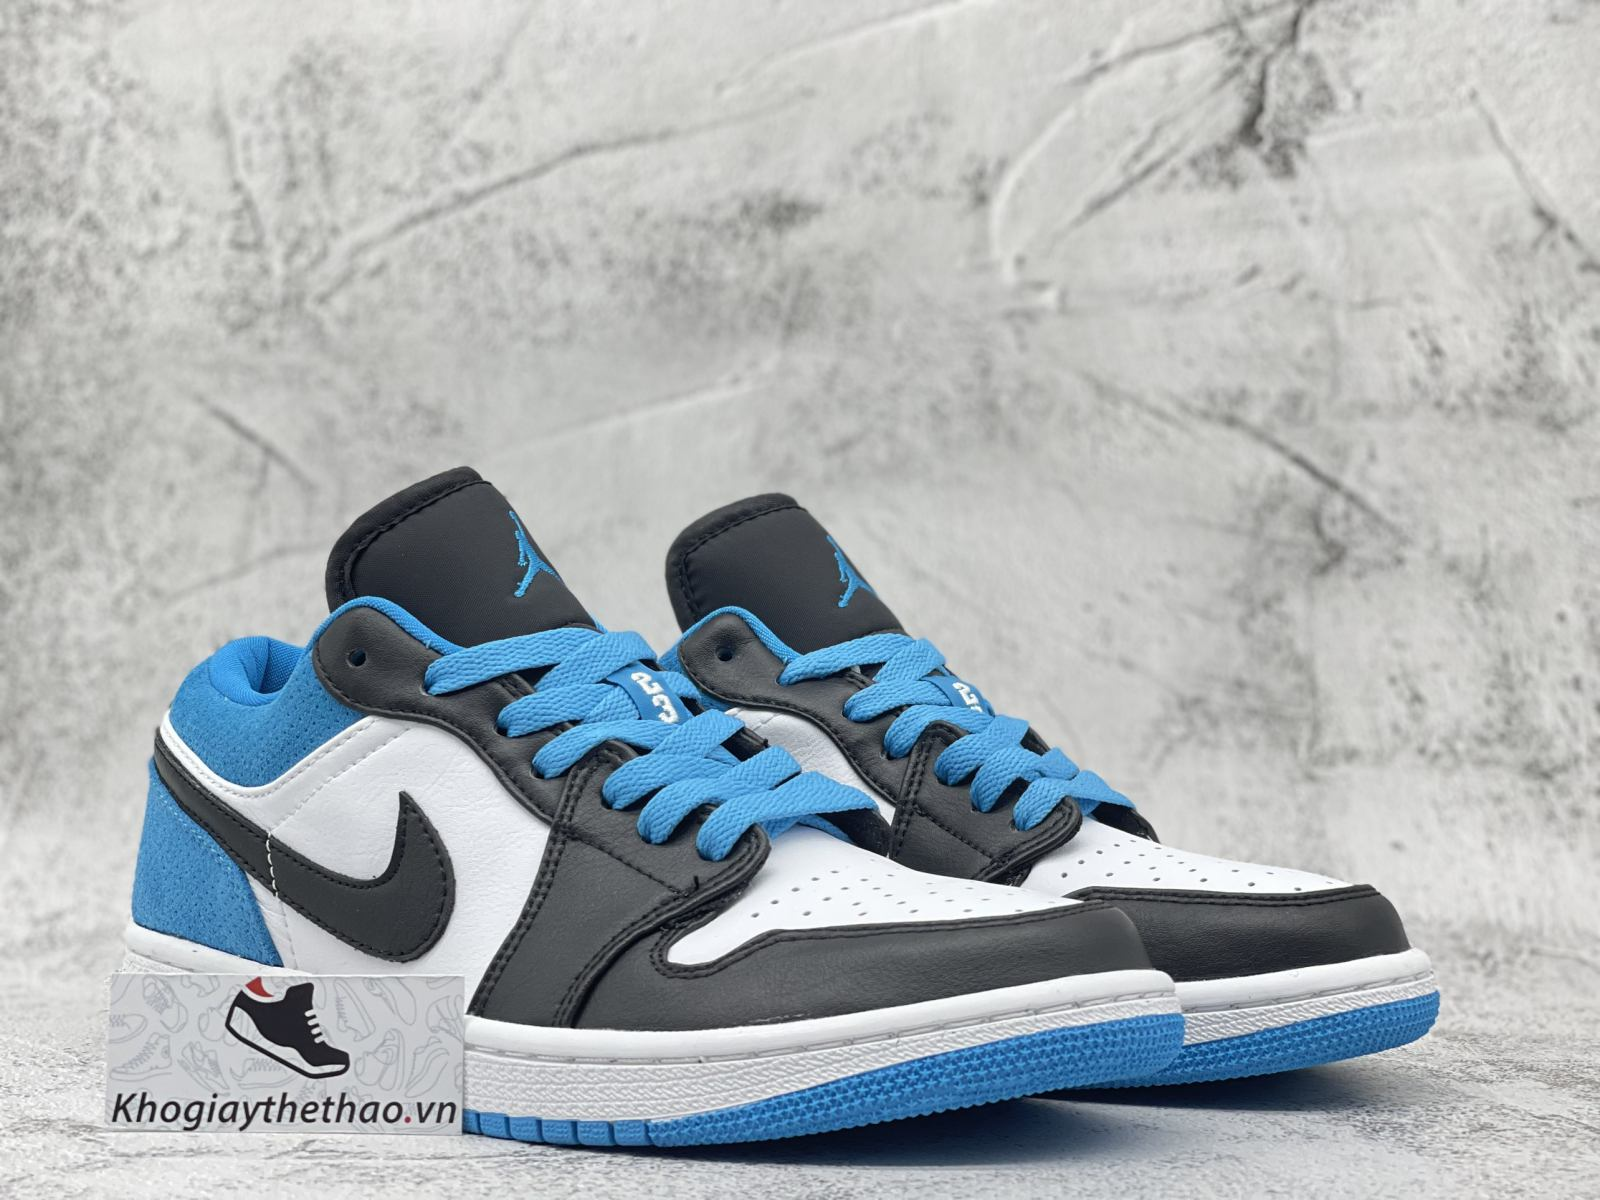 Giày Air Jordan 1 Low Laser Blue